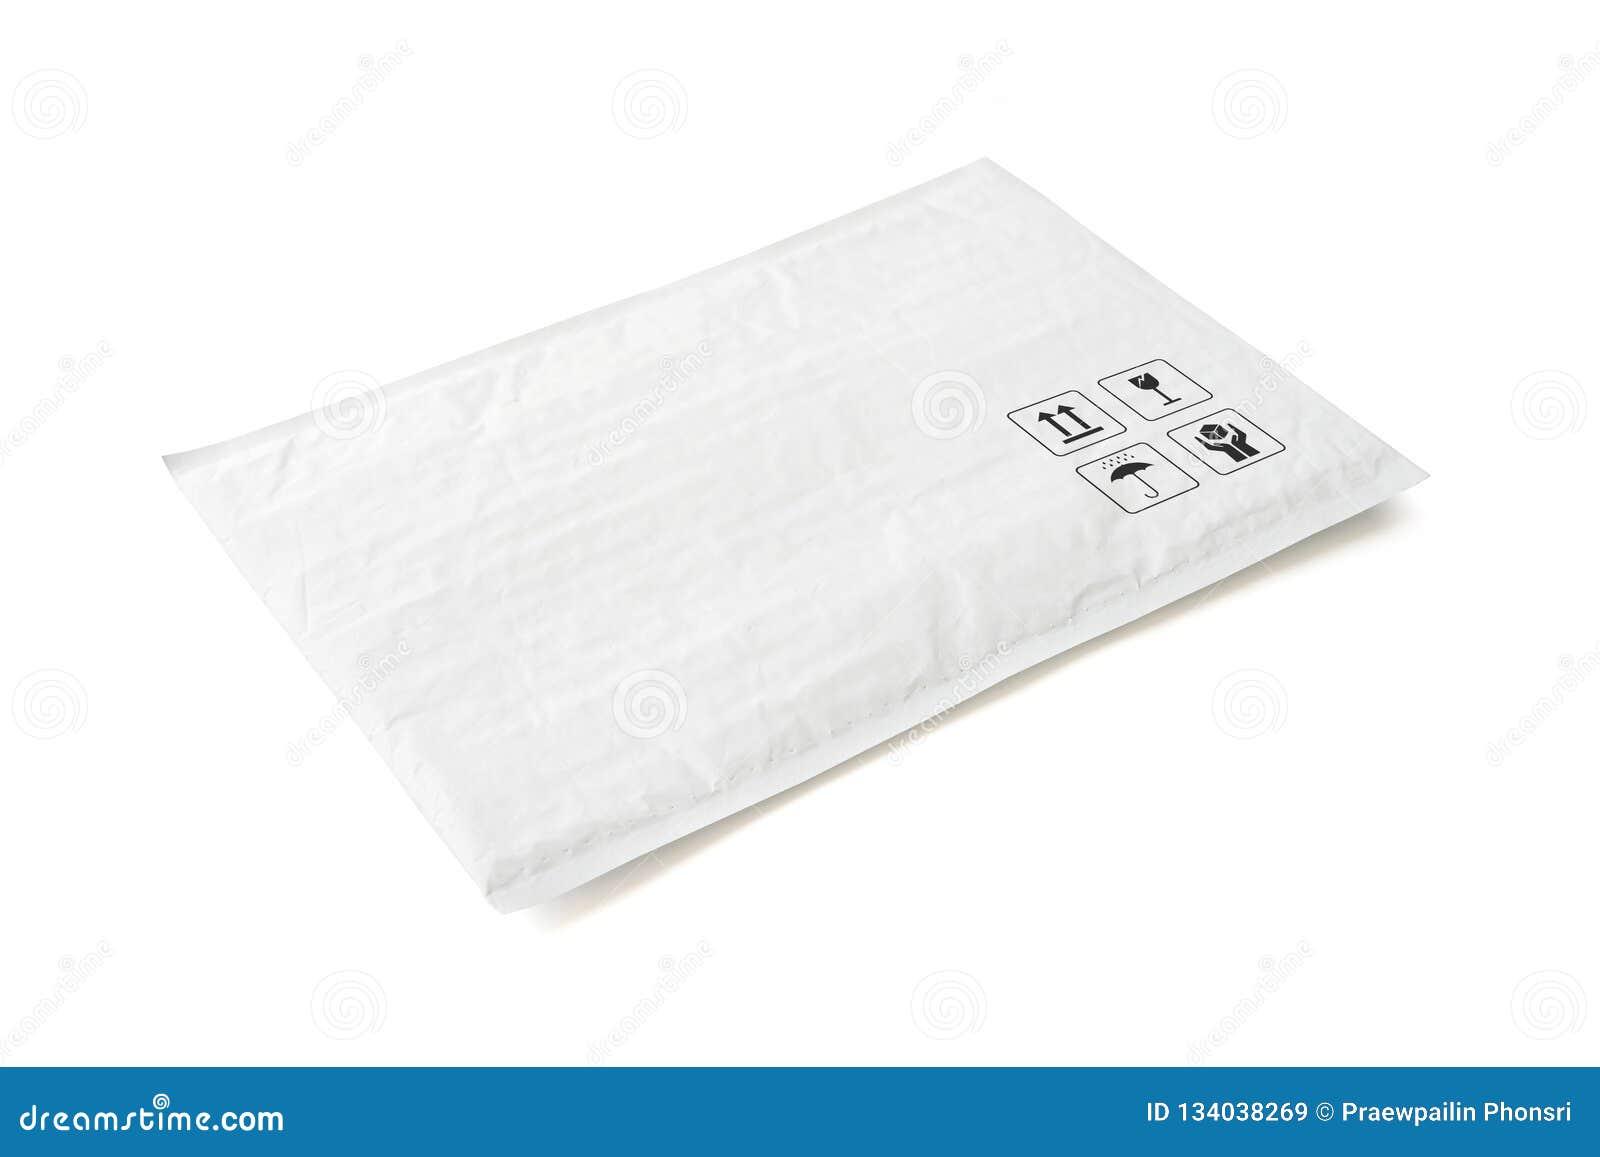 Pacote postal branco Pacote plástico com sinal e símbolo frágeis do cuidado Objeto isolado no fundo branco